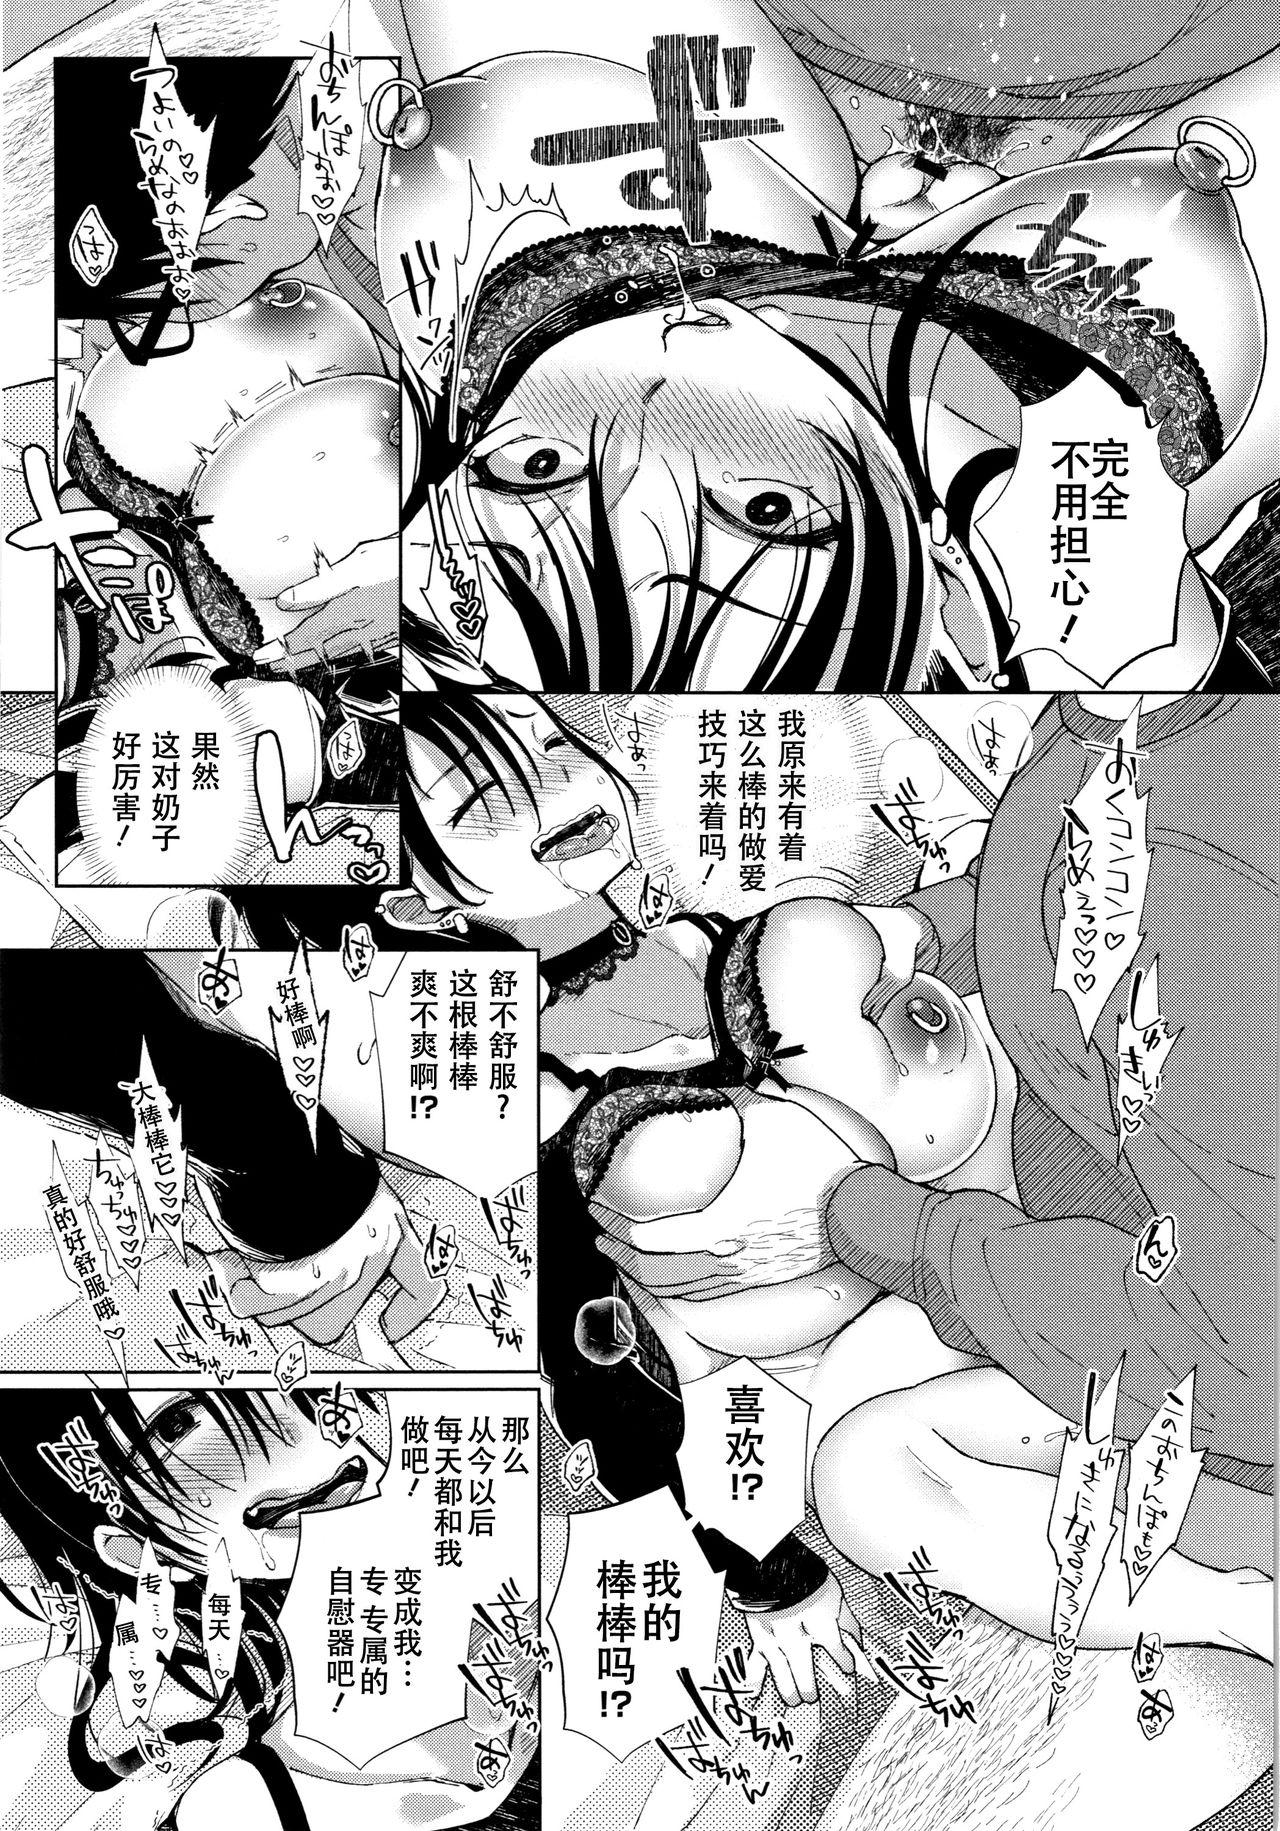 [Achumuchi] Saijaku Gal wa Ikizurai! - The weakest pussy is hard to go.ch.1-8 [Chinese] [战栗的玻璃棒汉化] [Ongoing] 15